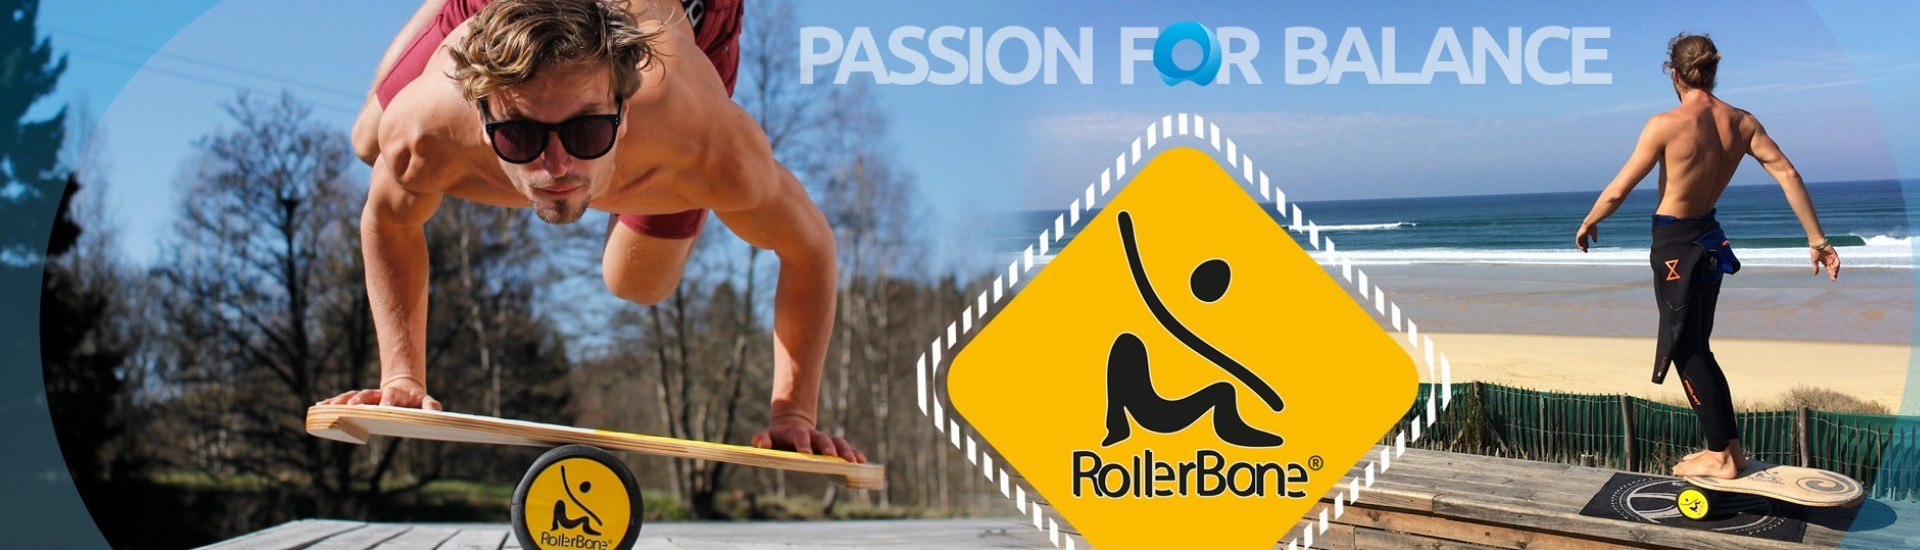 RollerBone Balance Boards